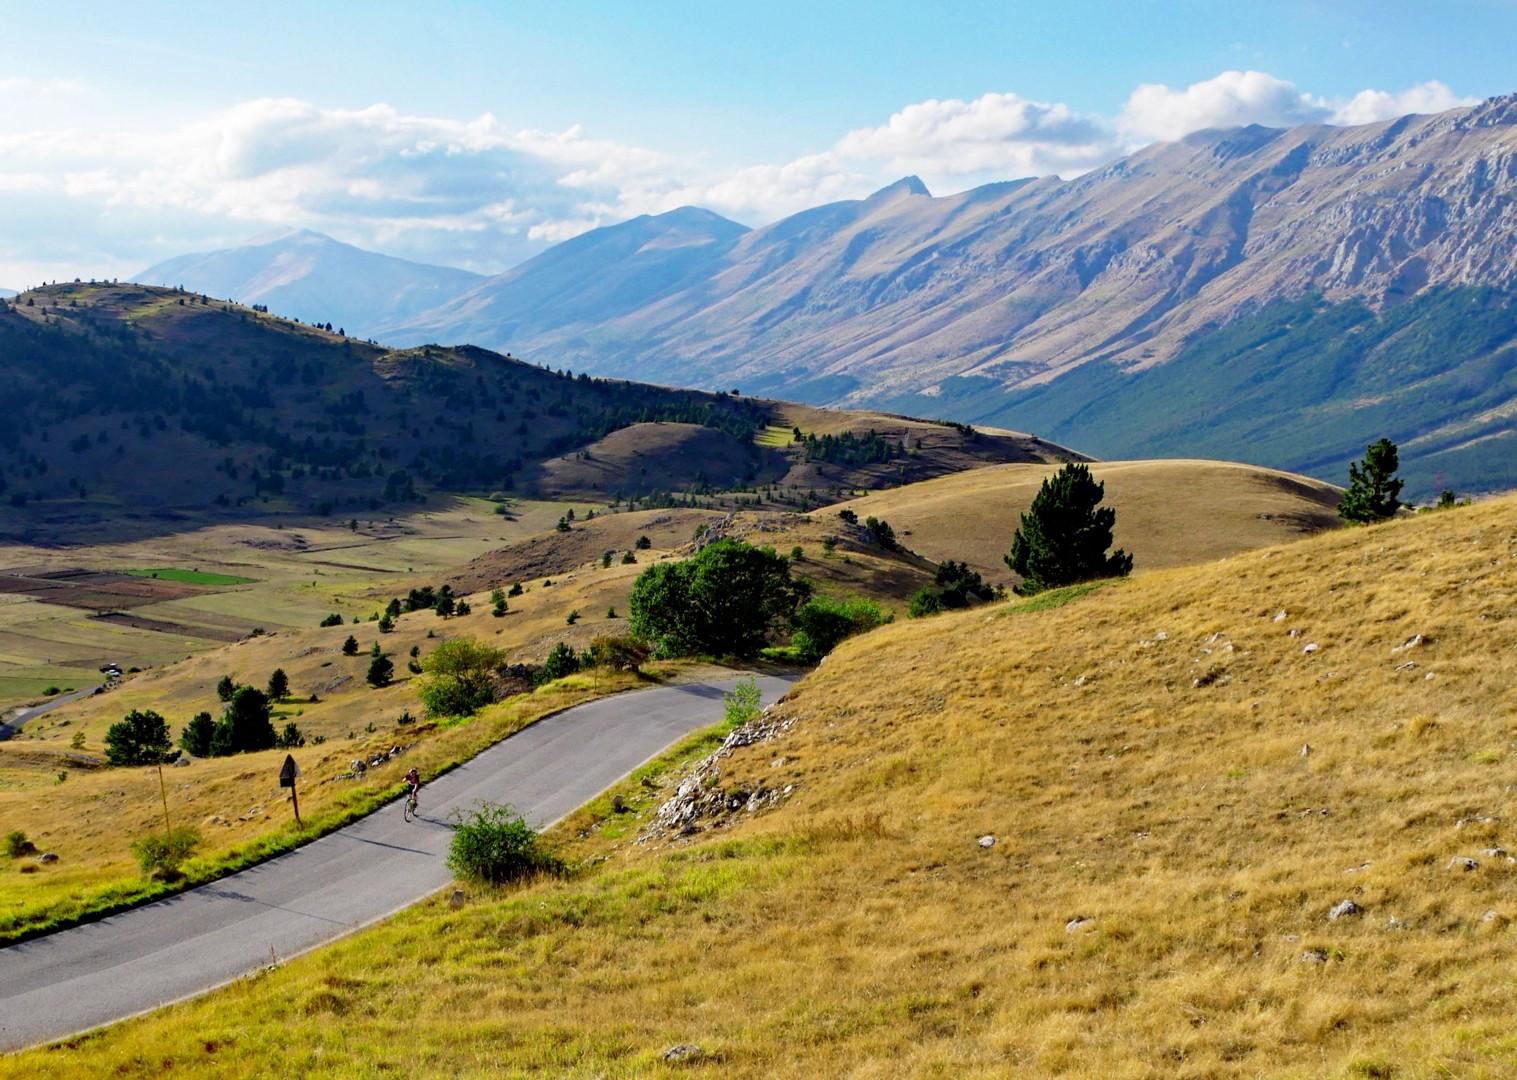 north-south-cycling-trip-gran-sasso.jpg - Italy - Grand Traverse - North to South - Guided Road Cycling Holiday (17 days) - Road Cycling